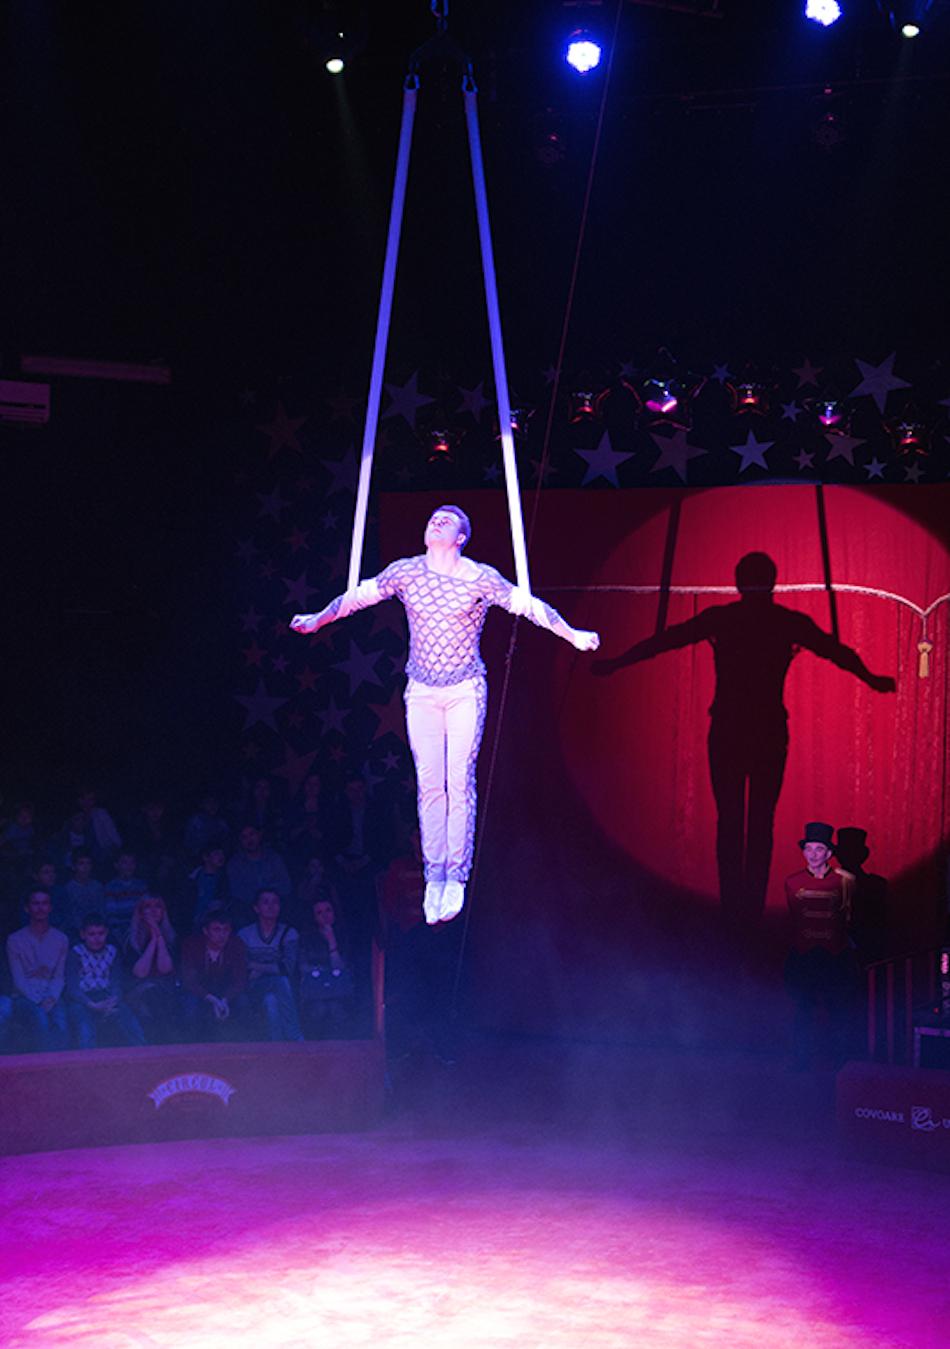 chisinau-circus-6